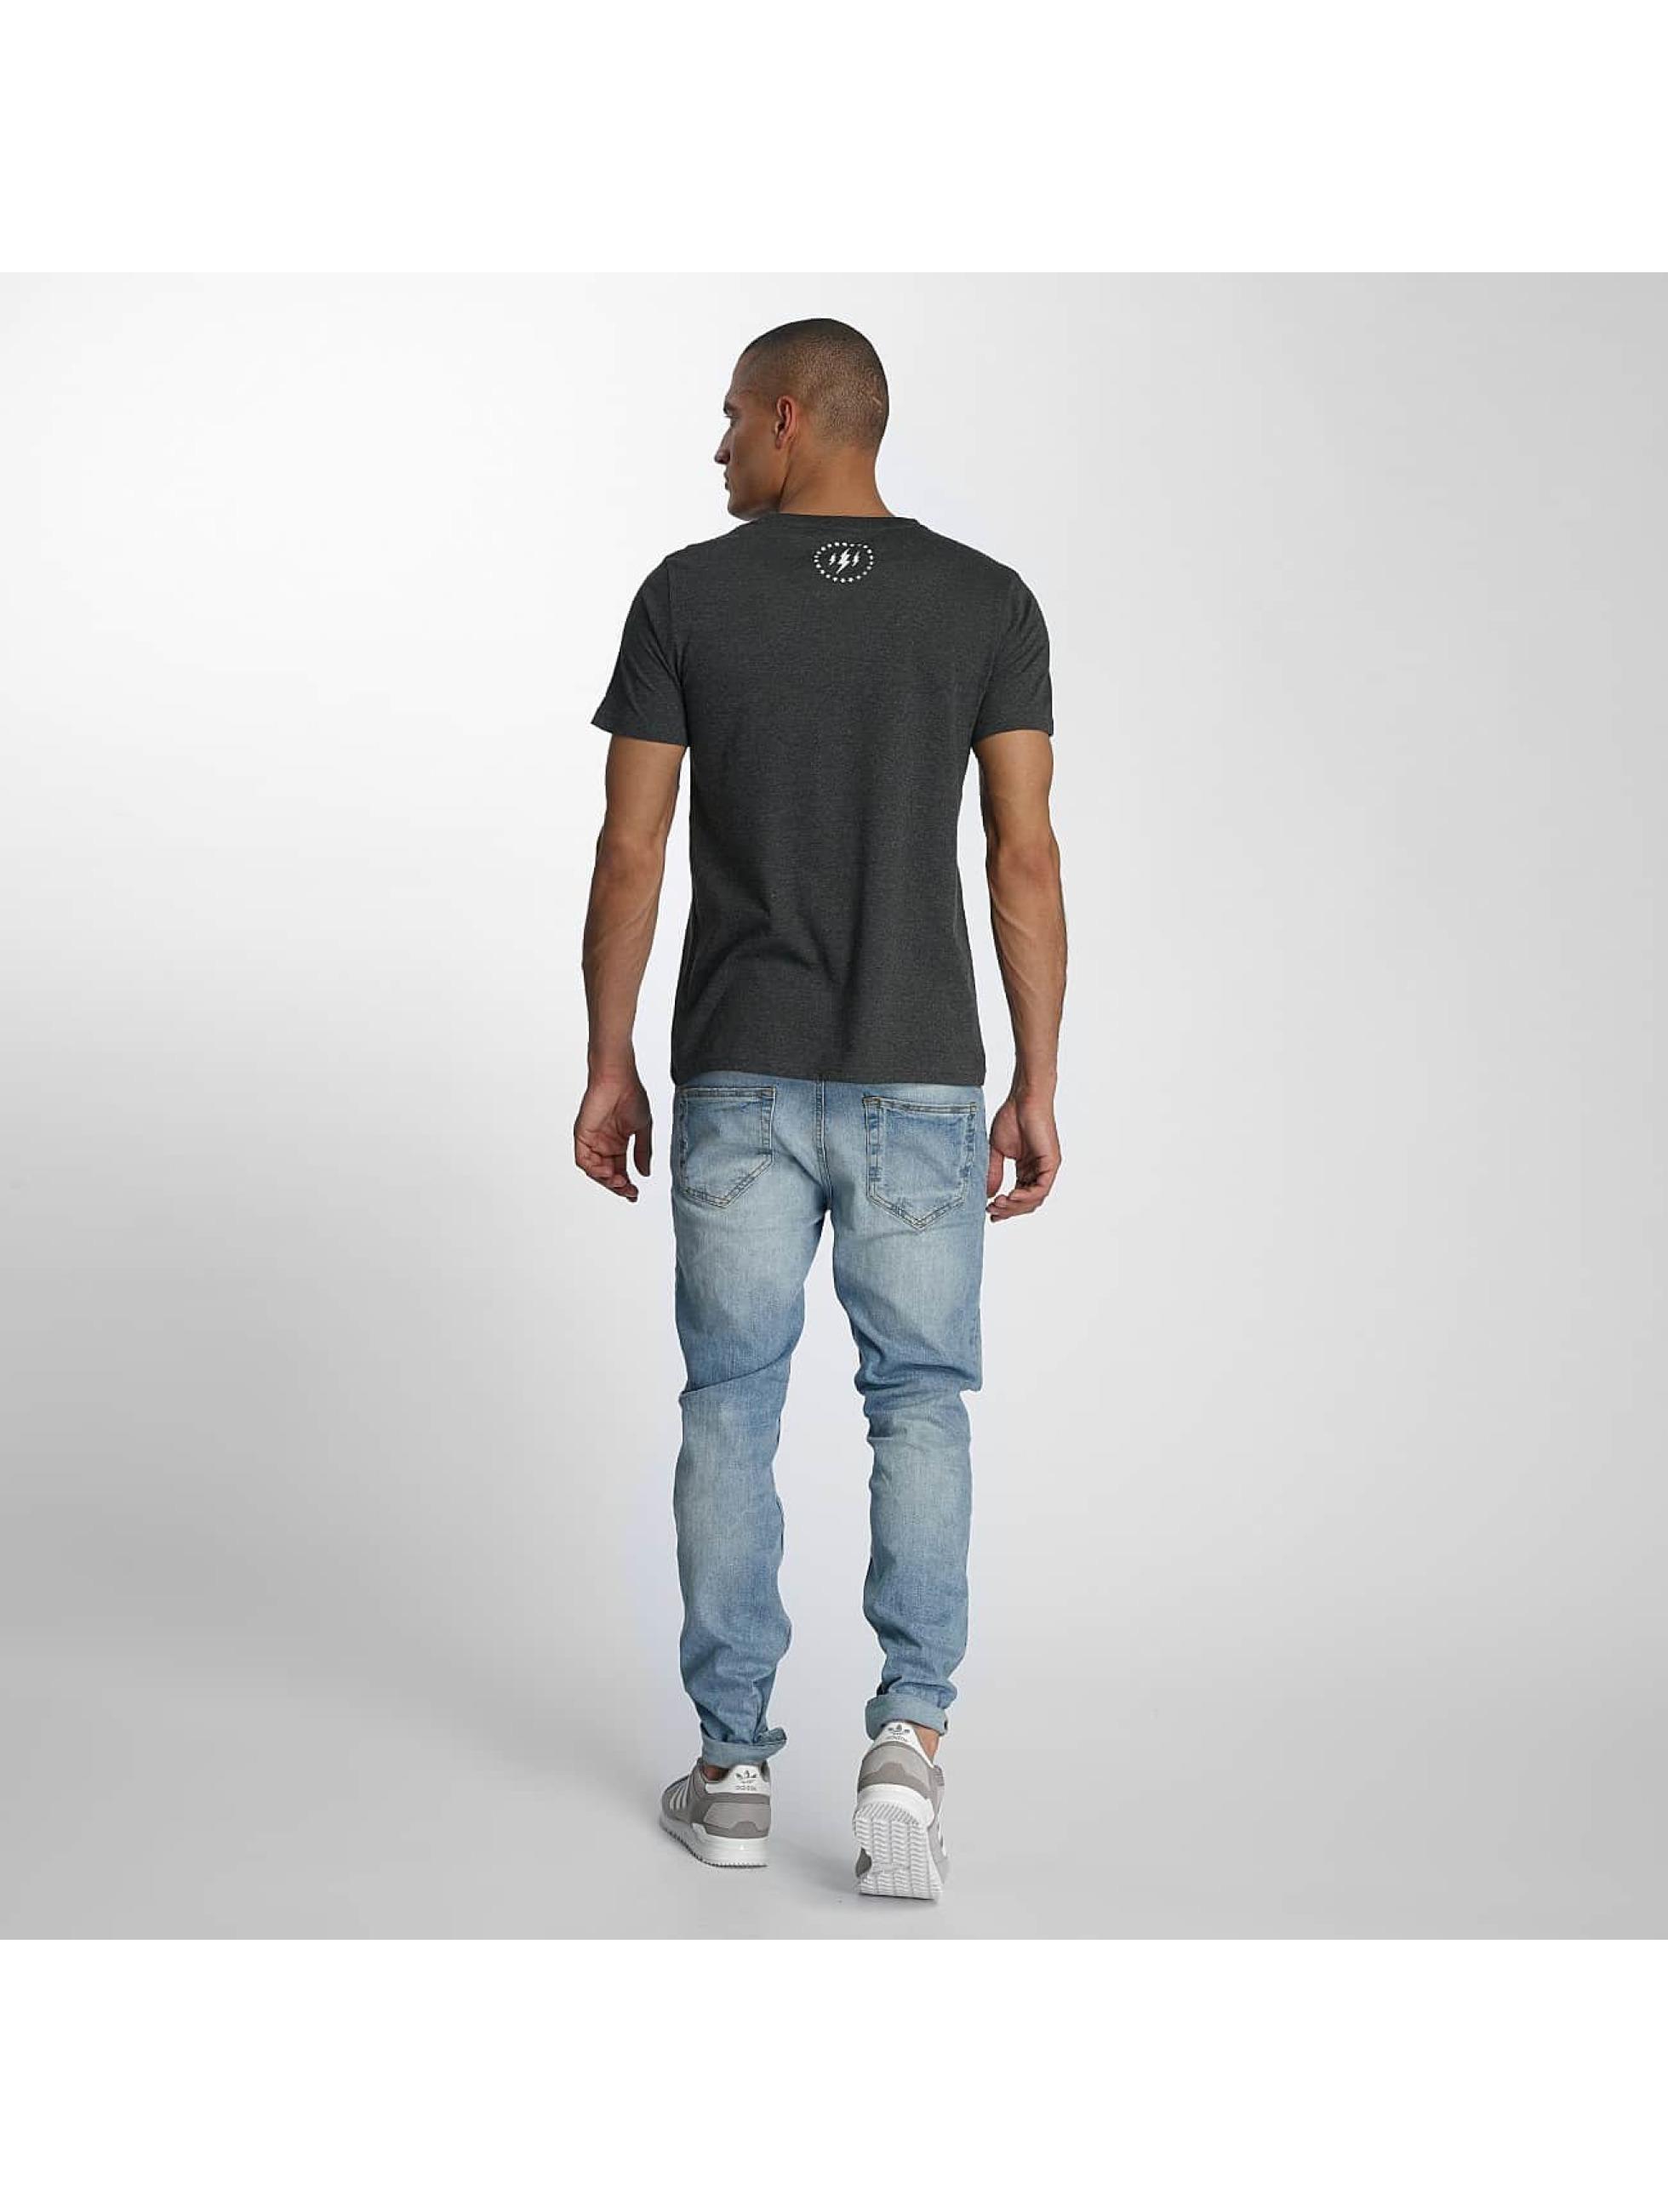 TrueSpin T-Shirt 8 grey